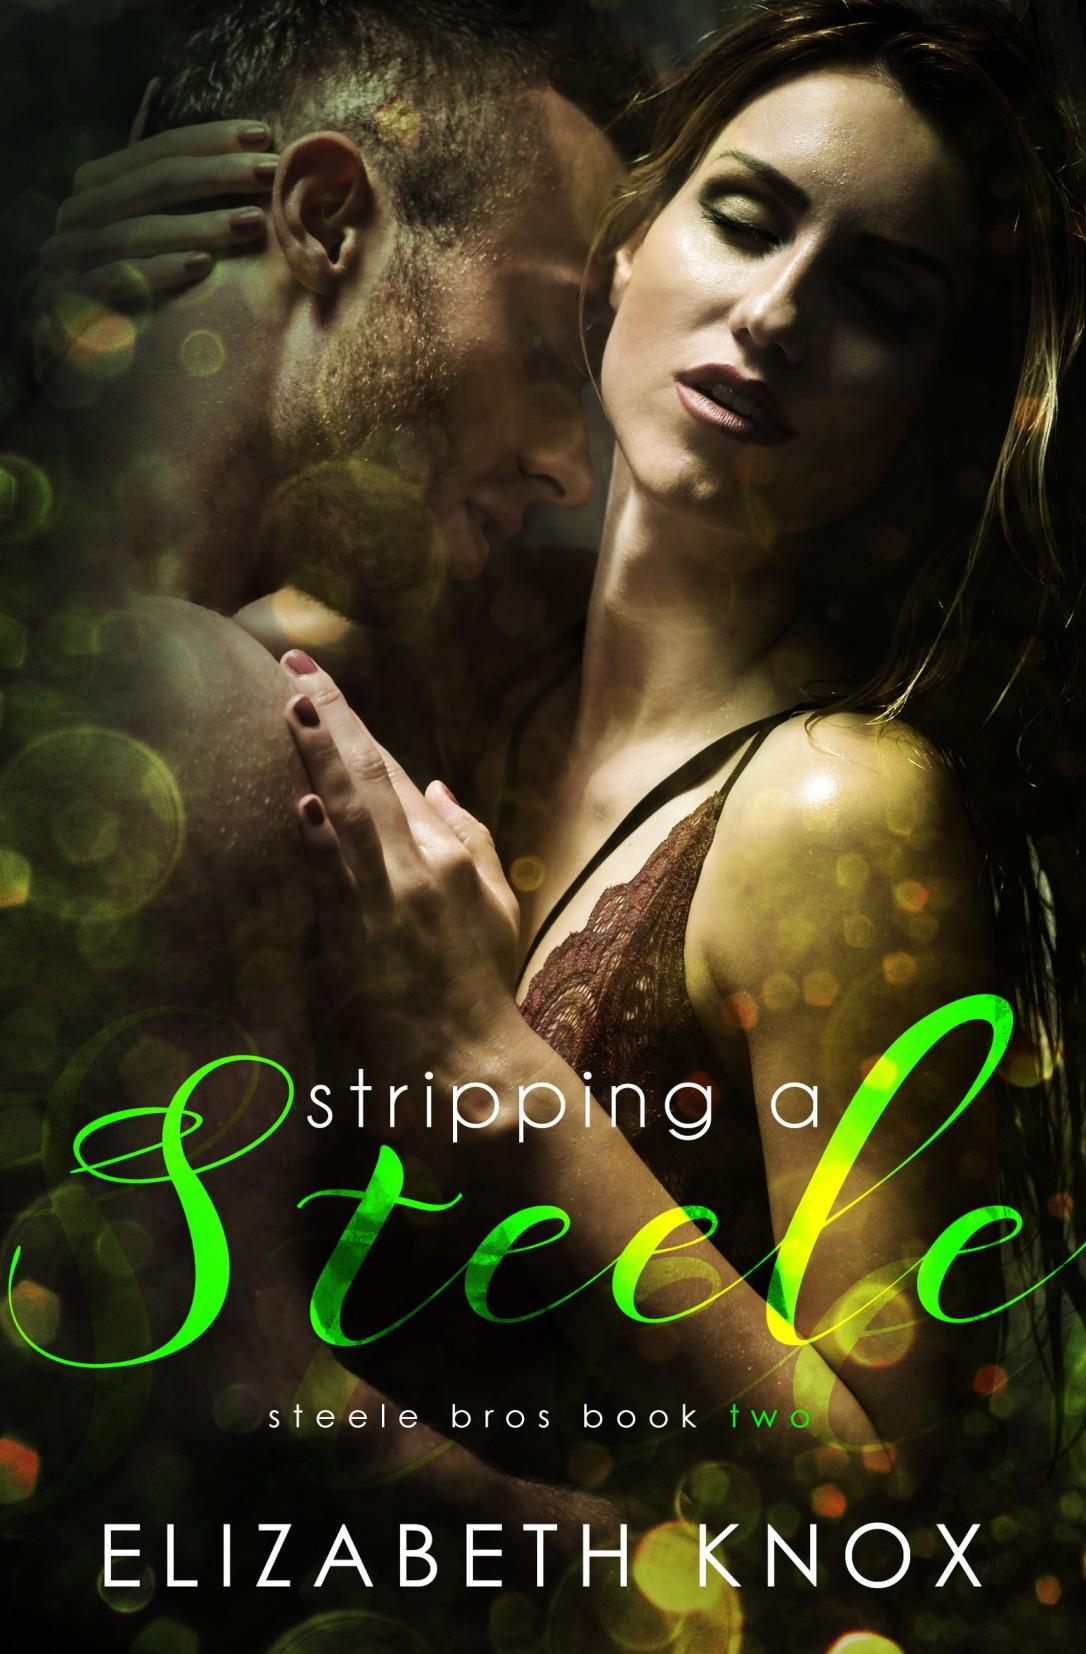 Stripping a Steele